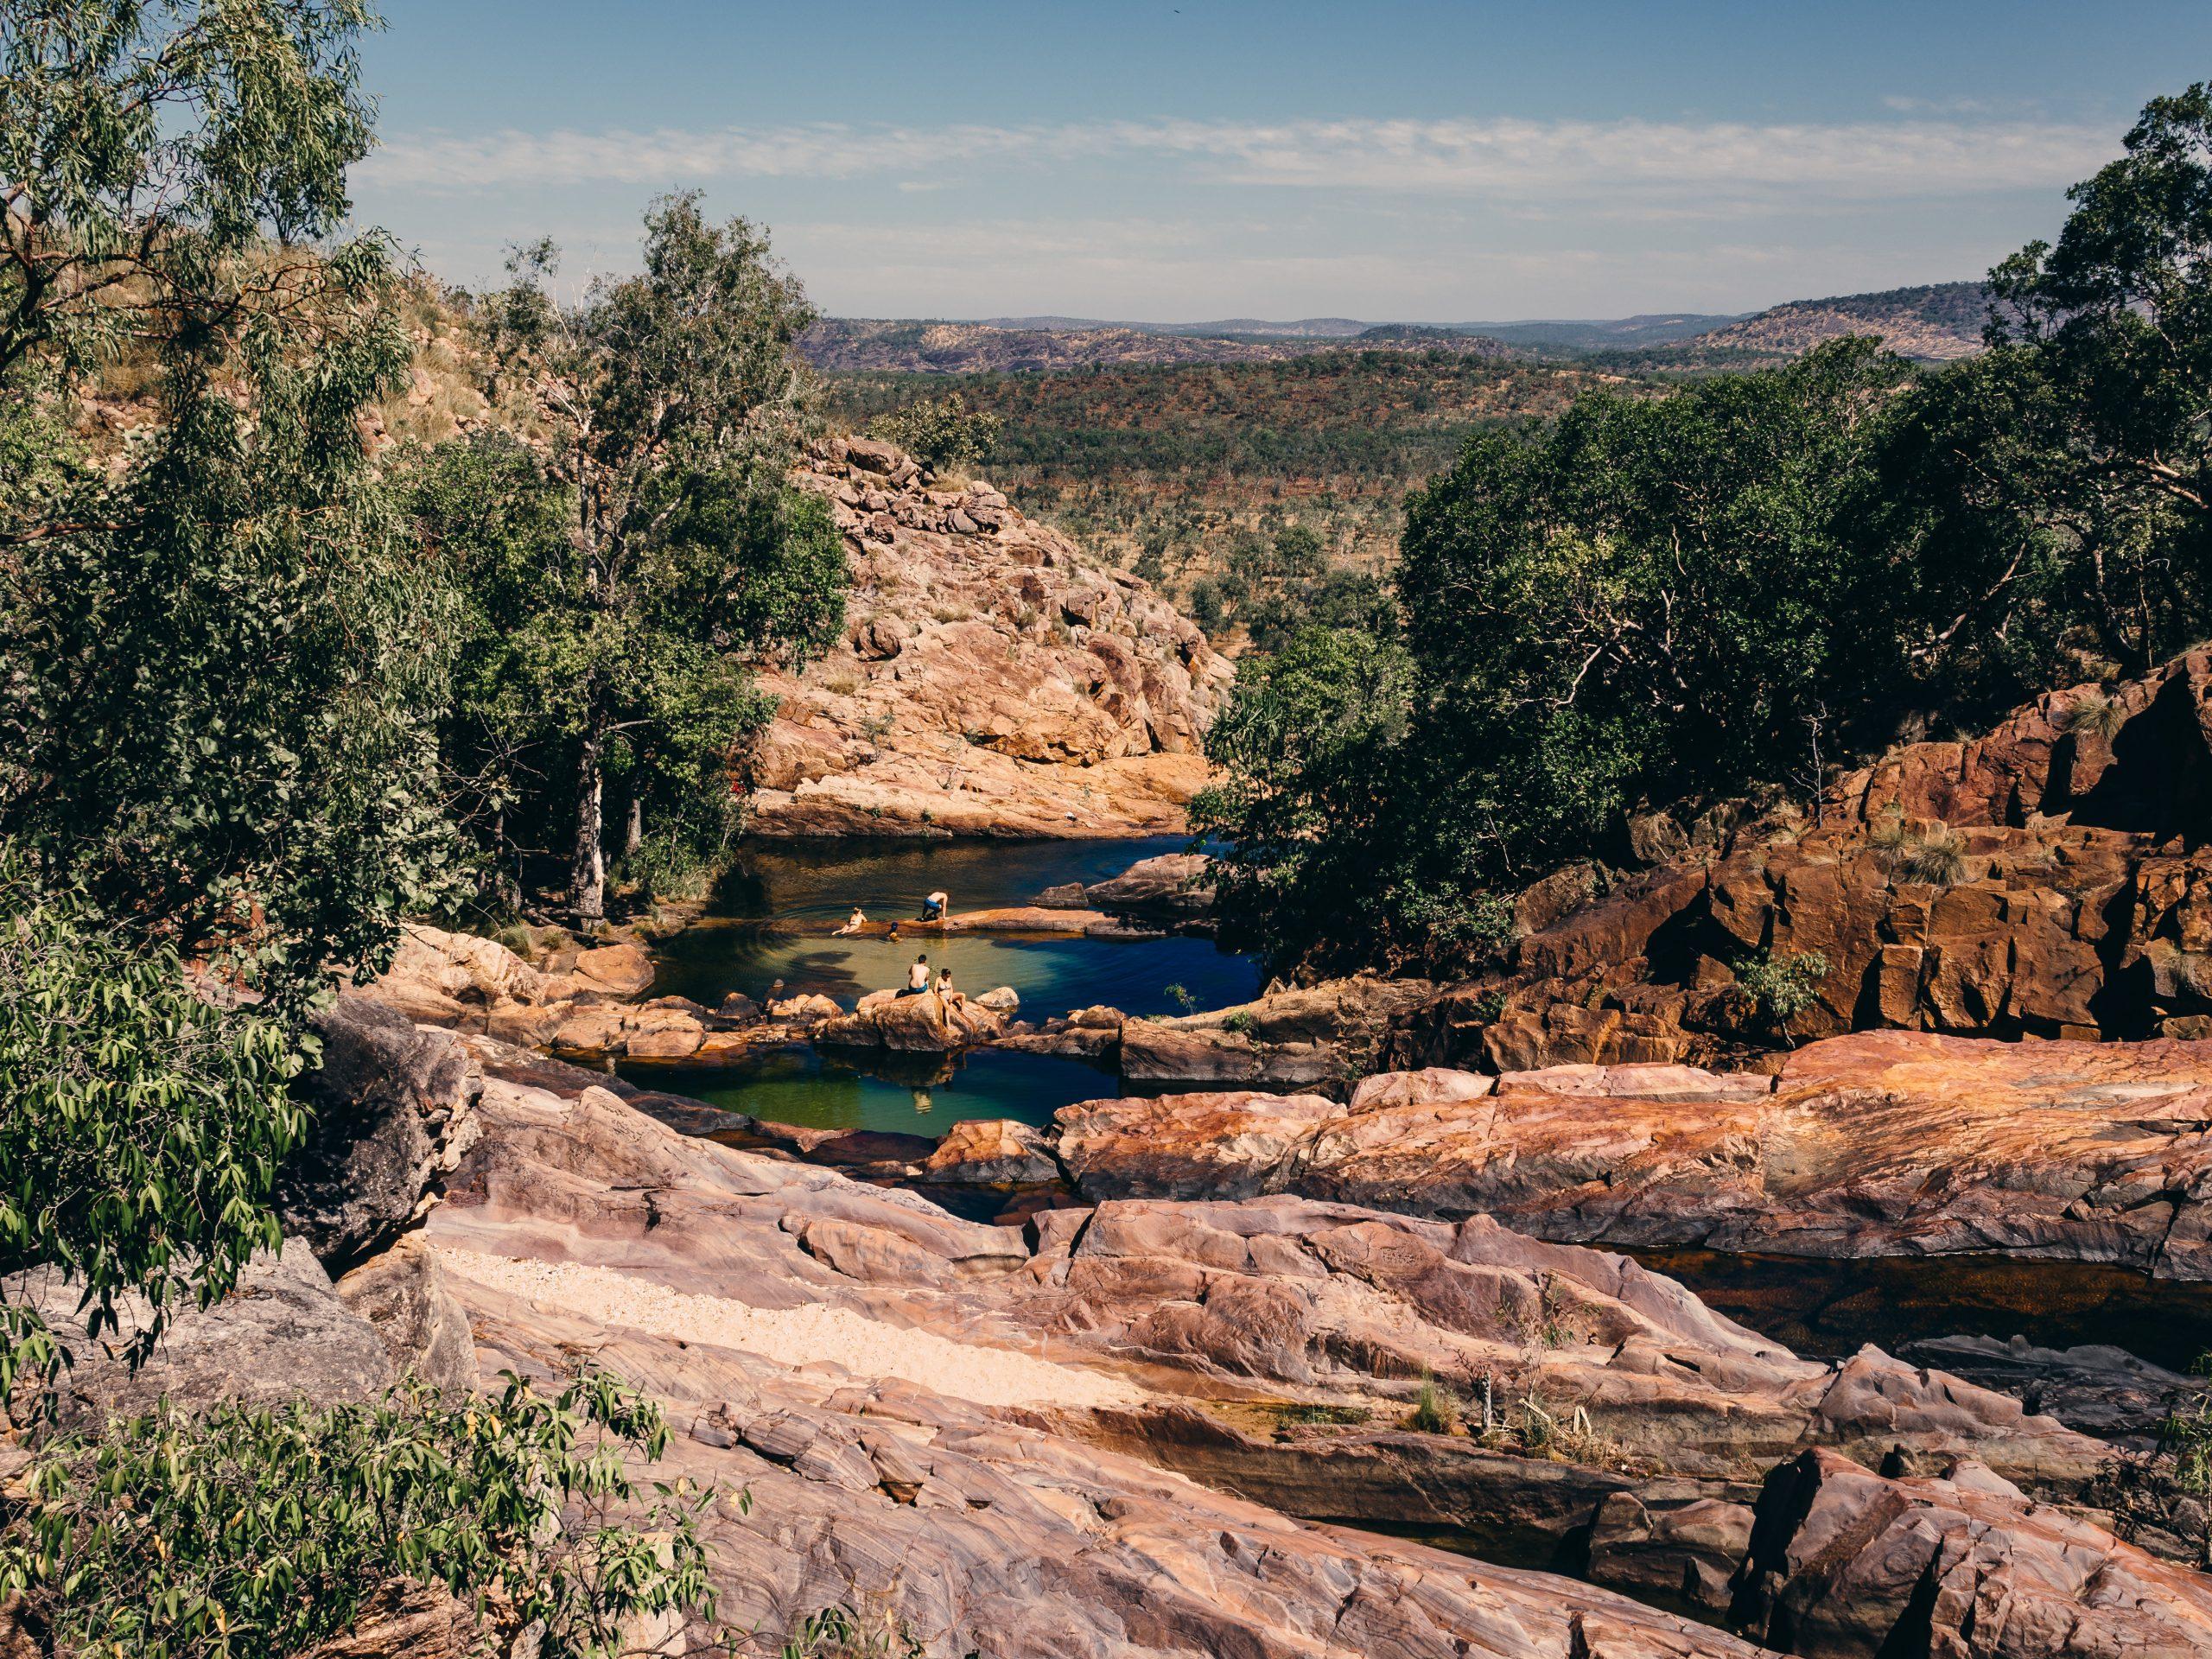 Kakadu, Arnhem Land & Gunlom Falls Adventure | Nature's infinity pool at Gunlom, Kakadu National Park, Northern Territory